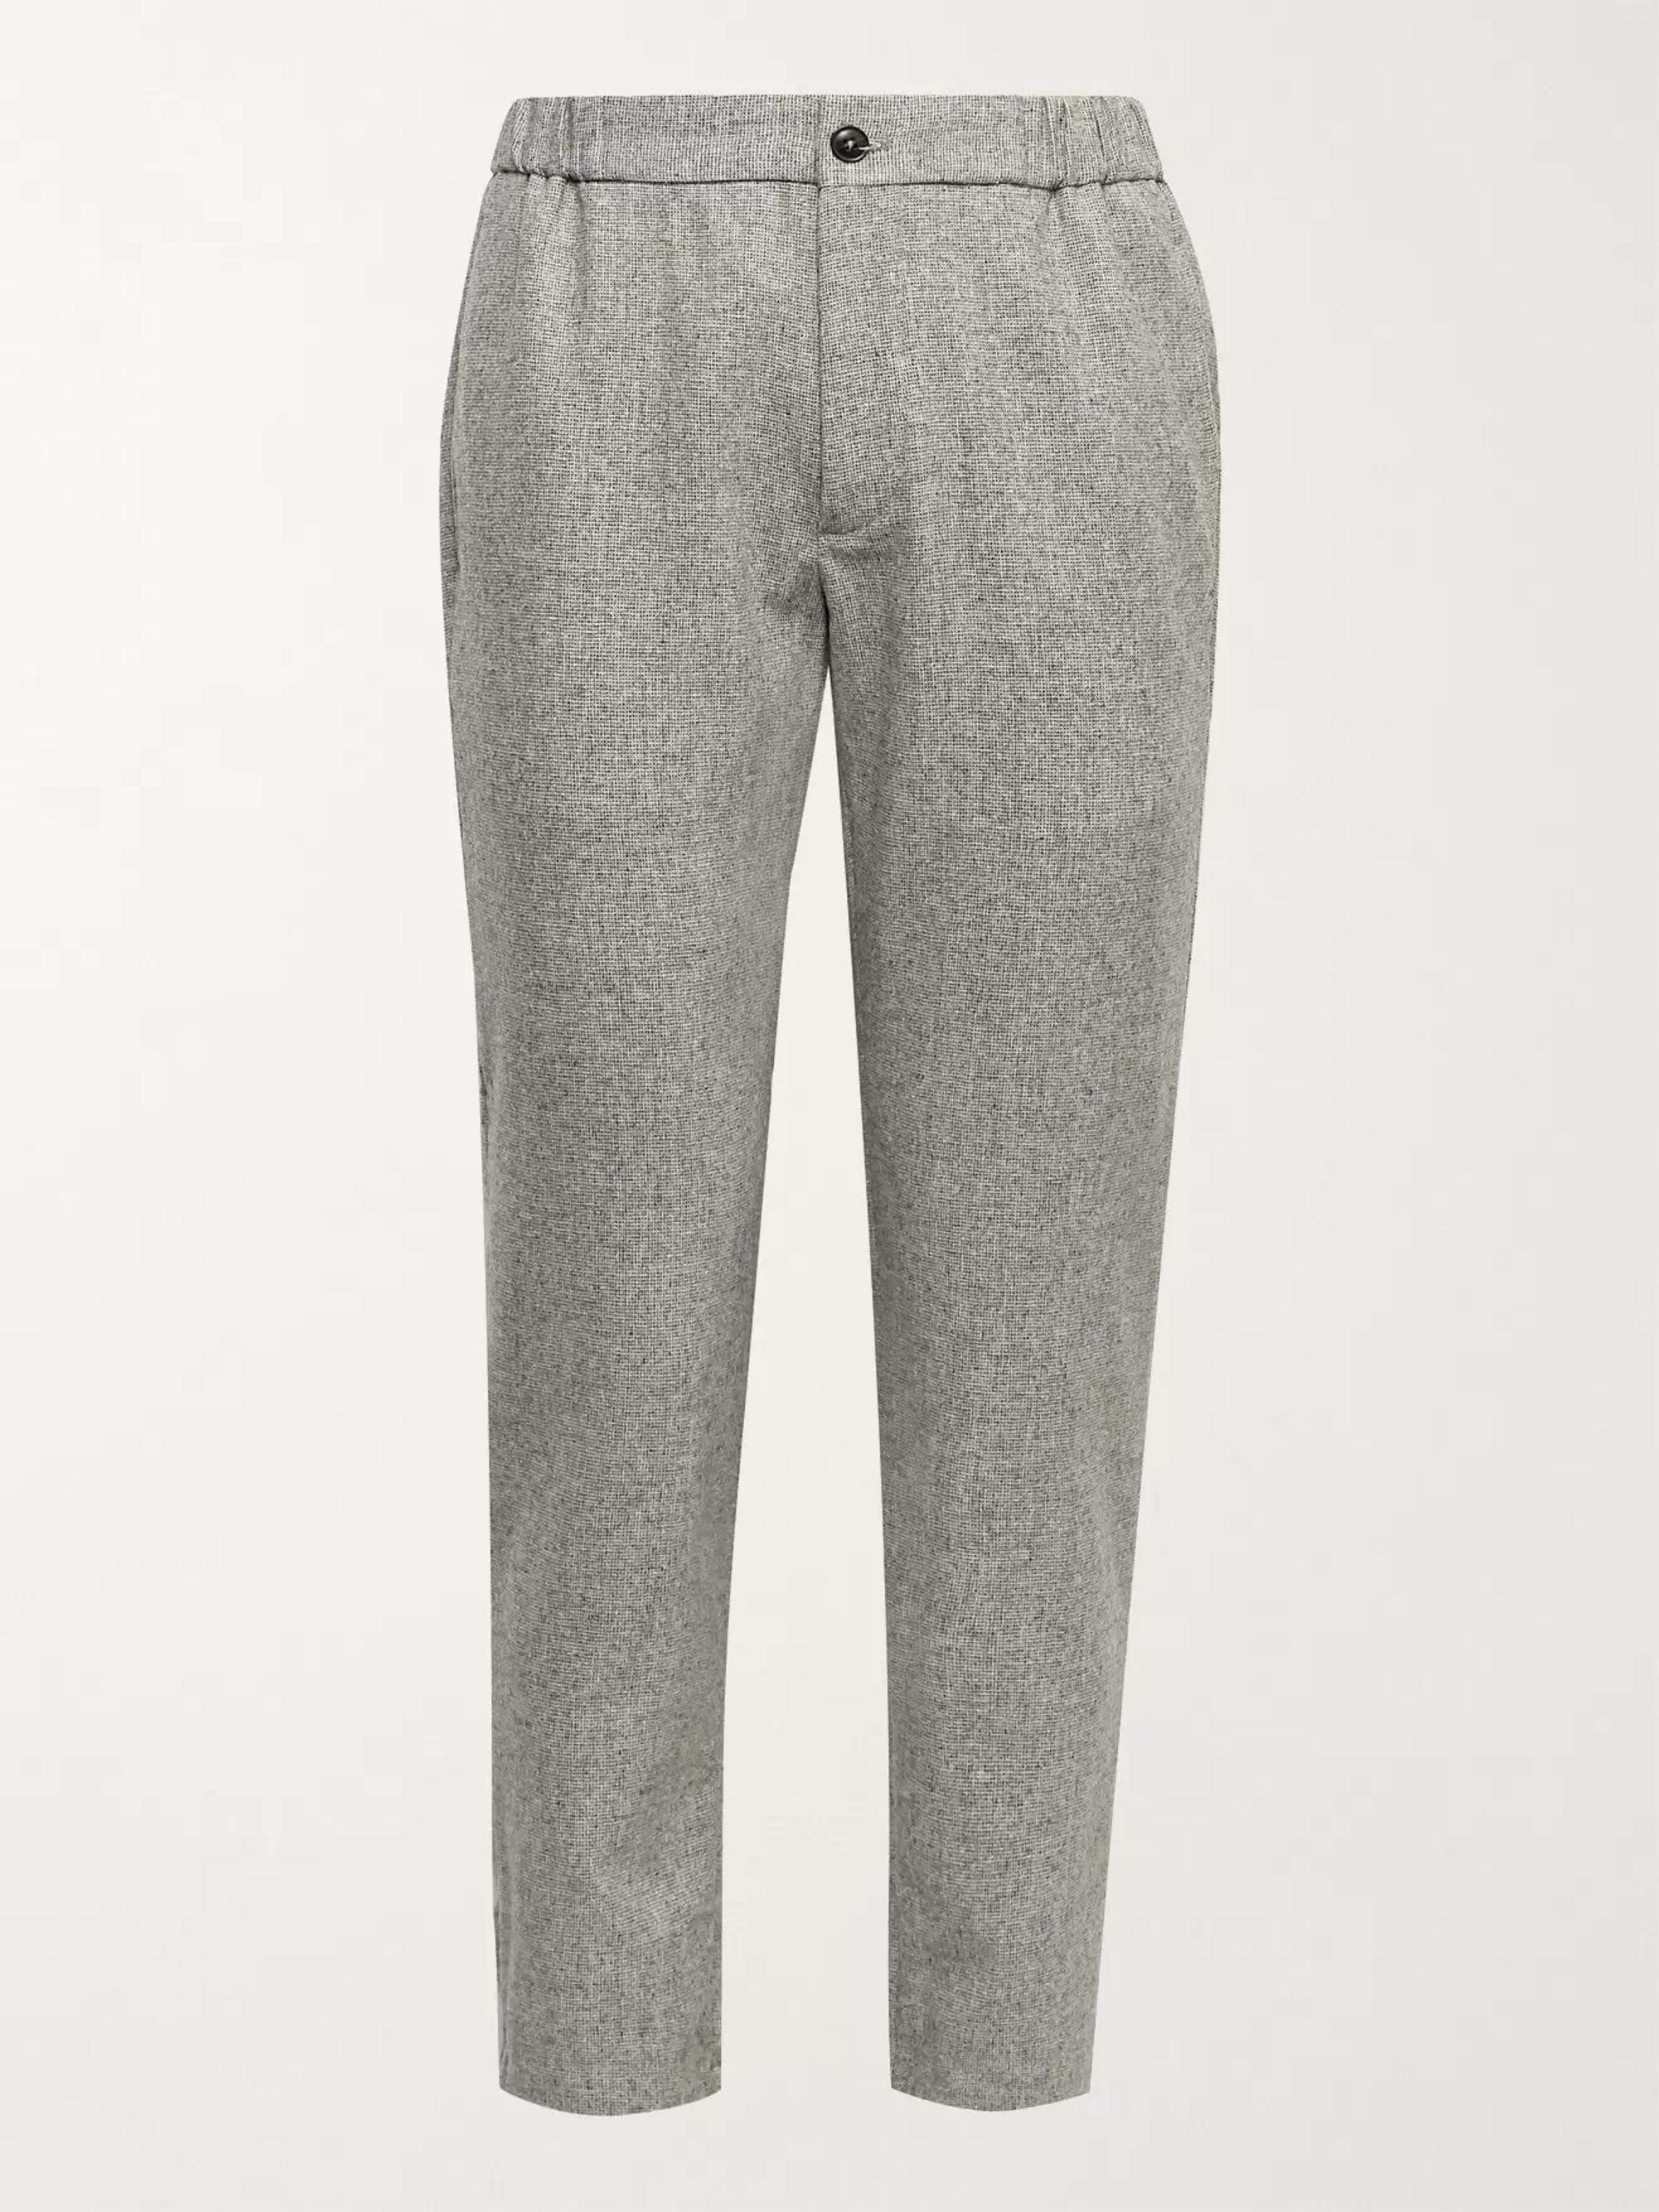 CLUB MONACO Lex Tapered Wool-Blend Donegal Tweed Trousers